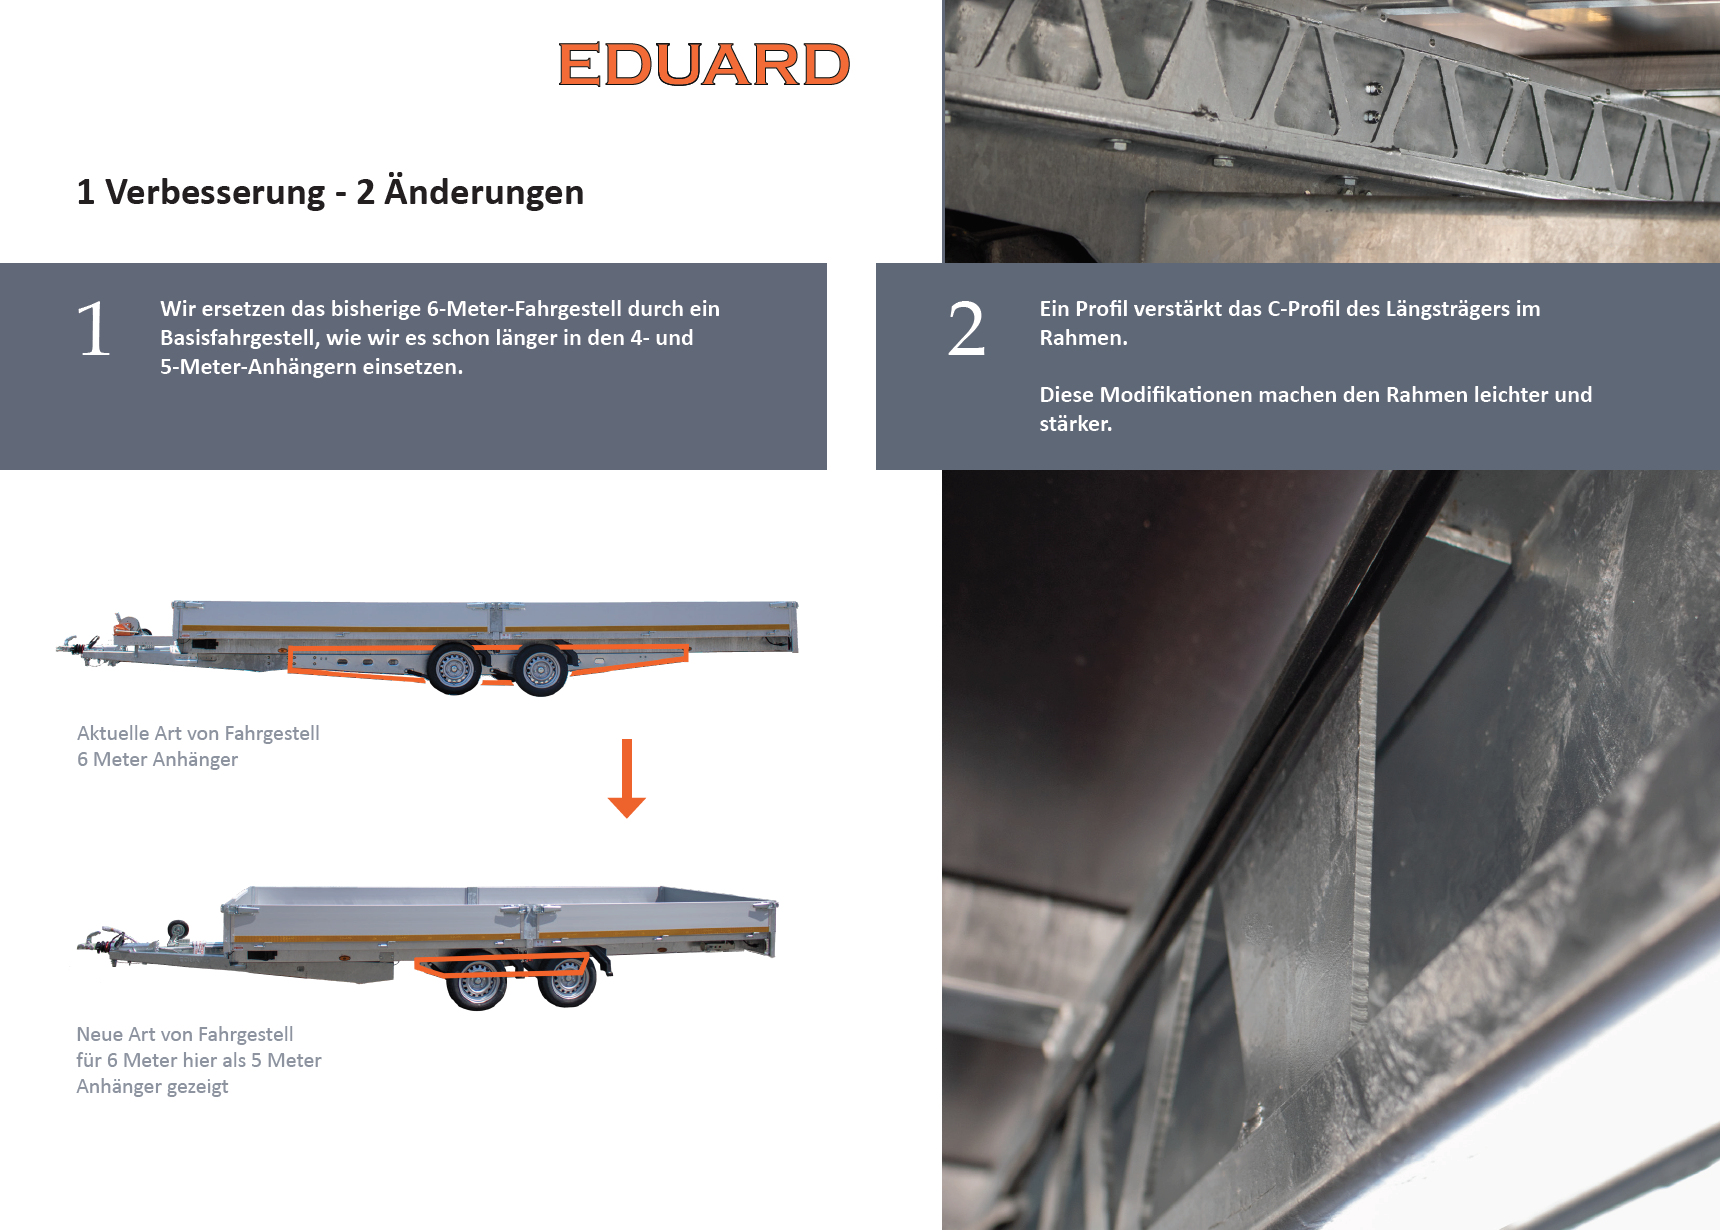 TRELEX PKW Anhänger. Eduard HL 6x2 m 3000 kg